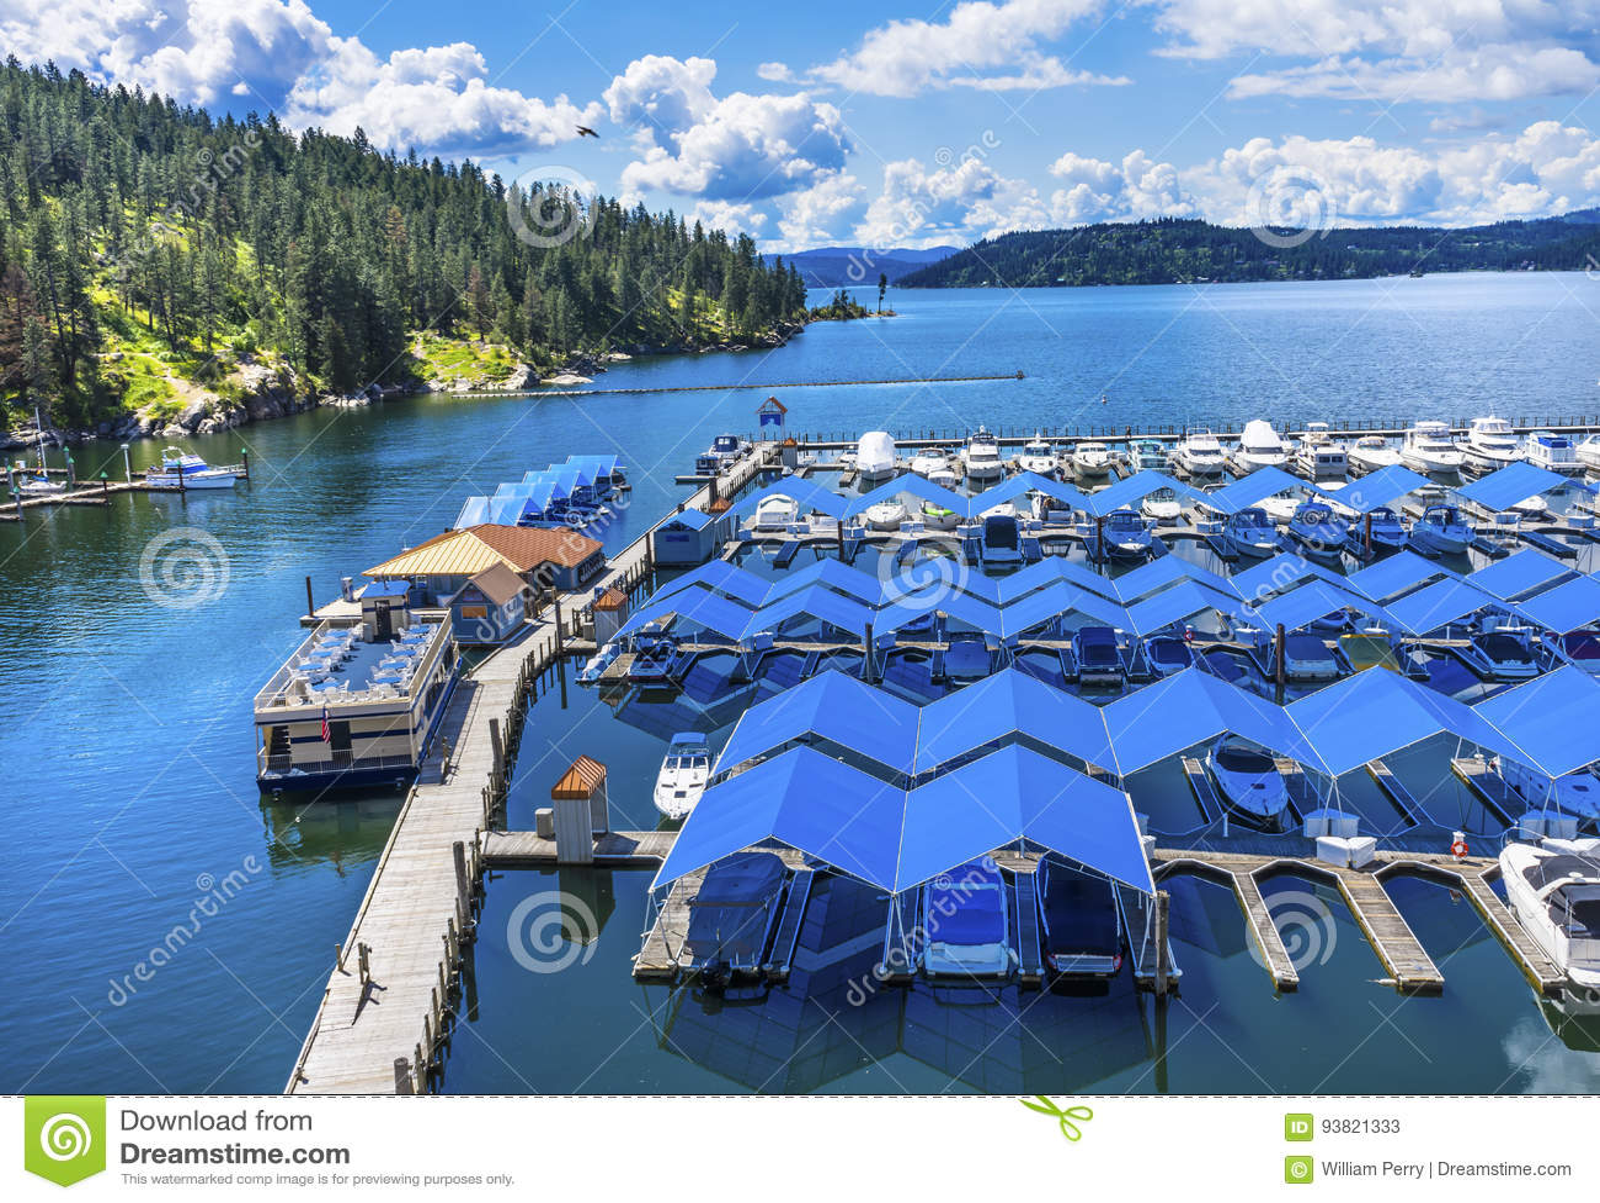 Boardwalk Marina Piers Boats Reflection Lake Coeur d`Alene Idaho